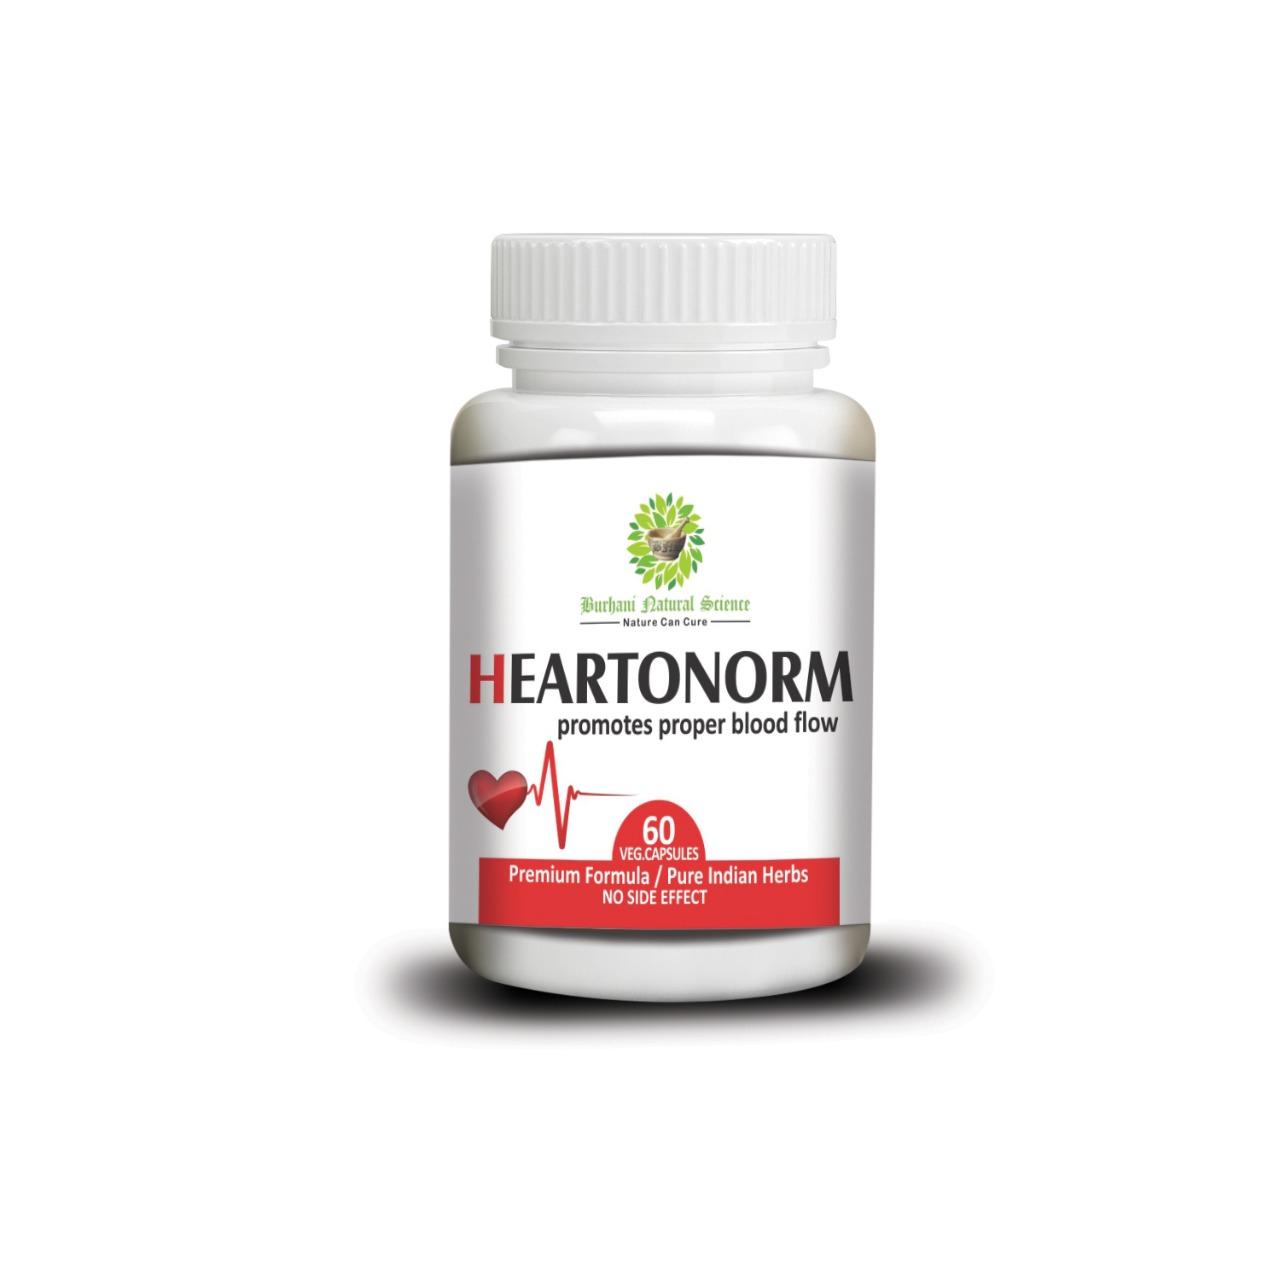 BNS HEARTONORM